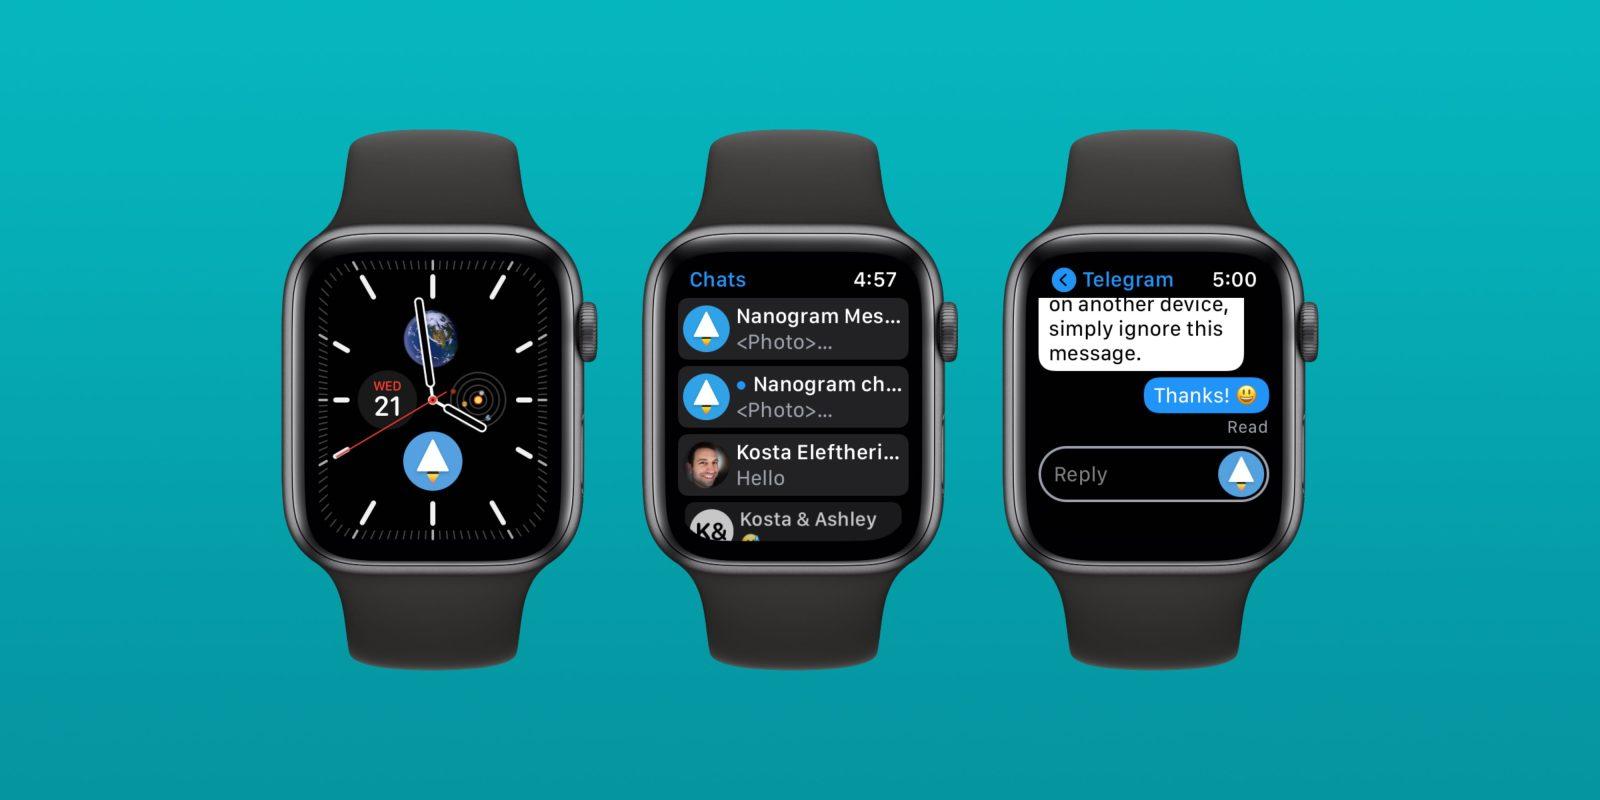 'Nanogram Messenger' brings the full Telegram experience to your Apple Watch